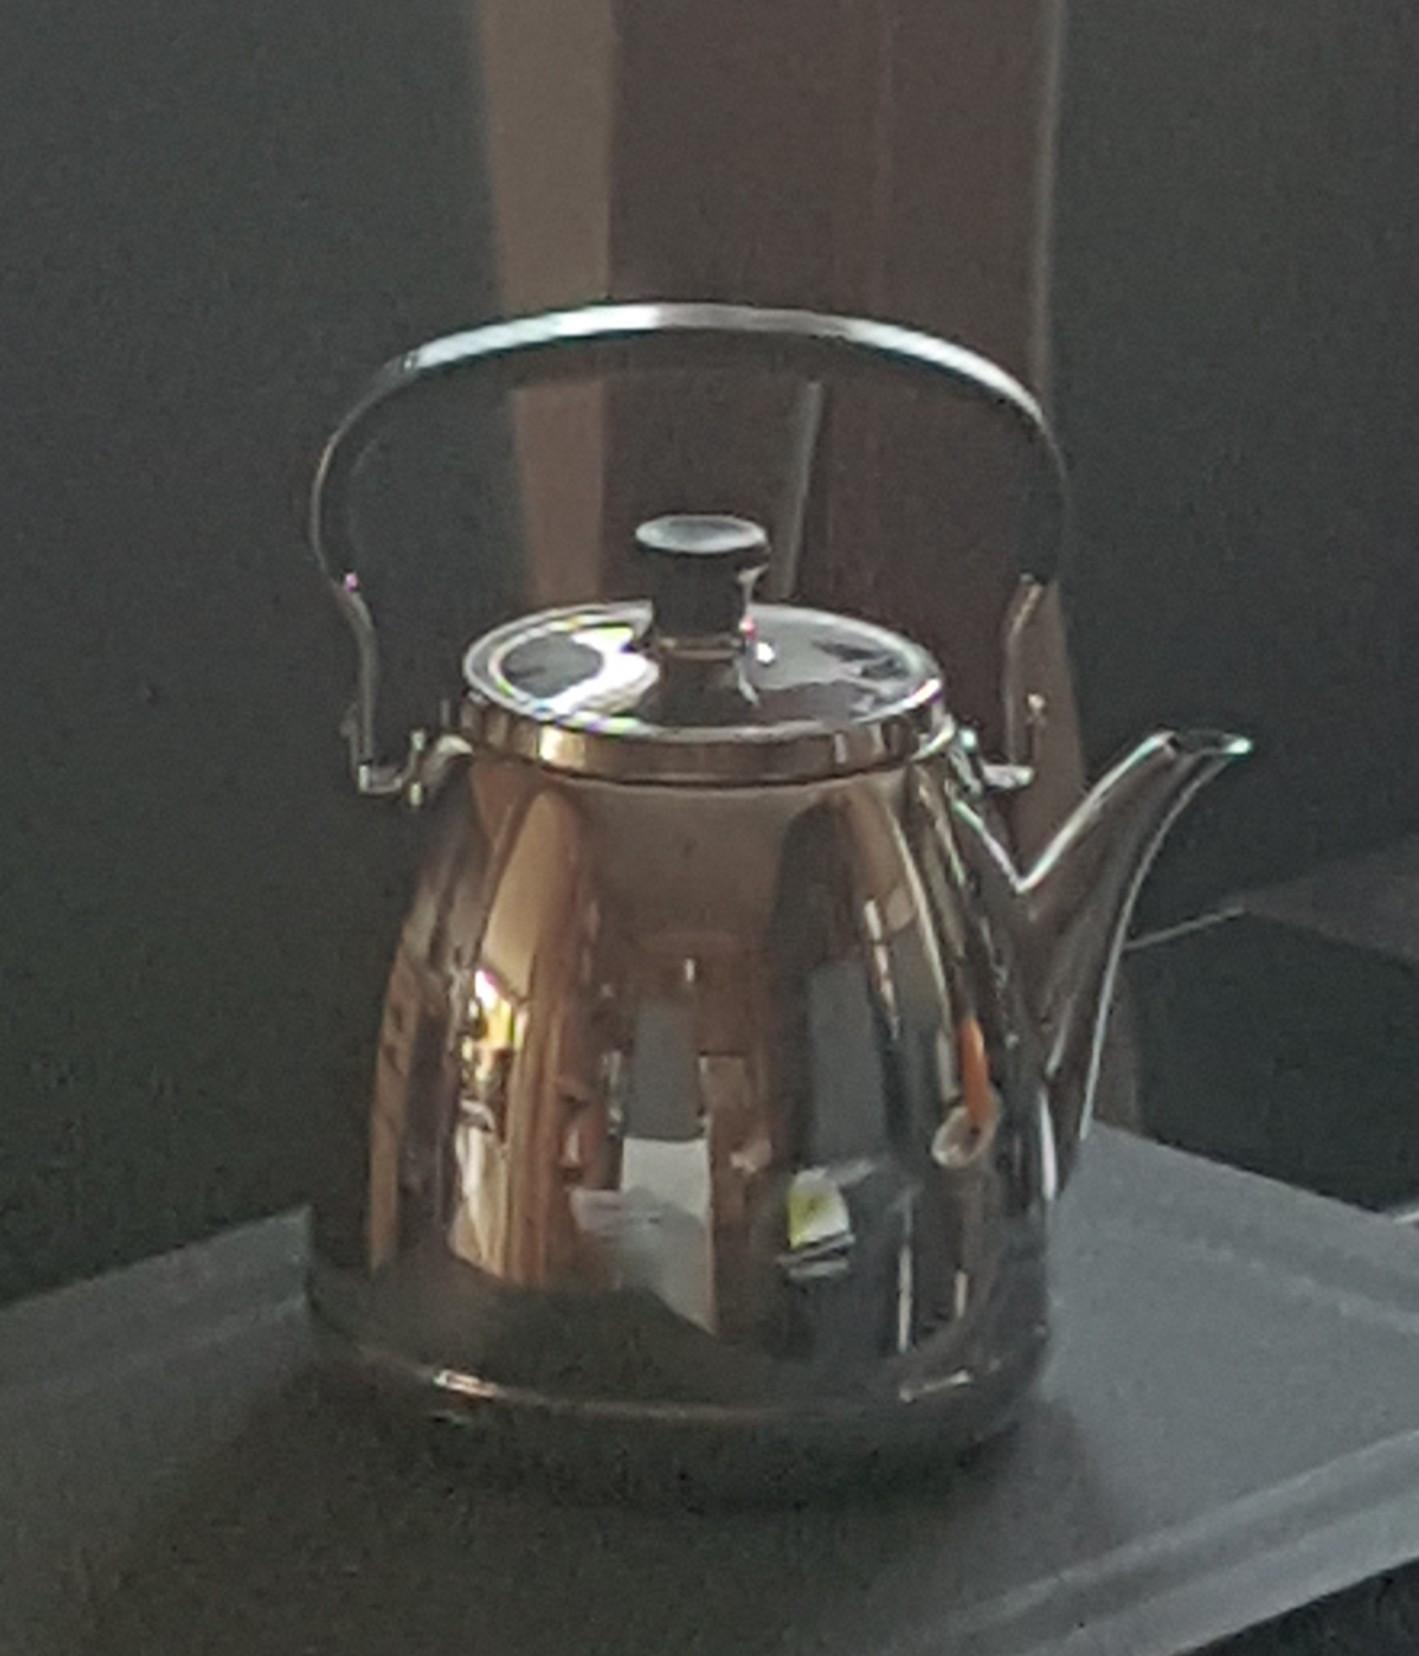 Fasjonable Kaffe / vann-kjele i stål 2.5 l. Polaris | FINN.no TN-38